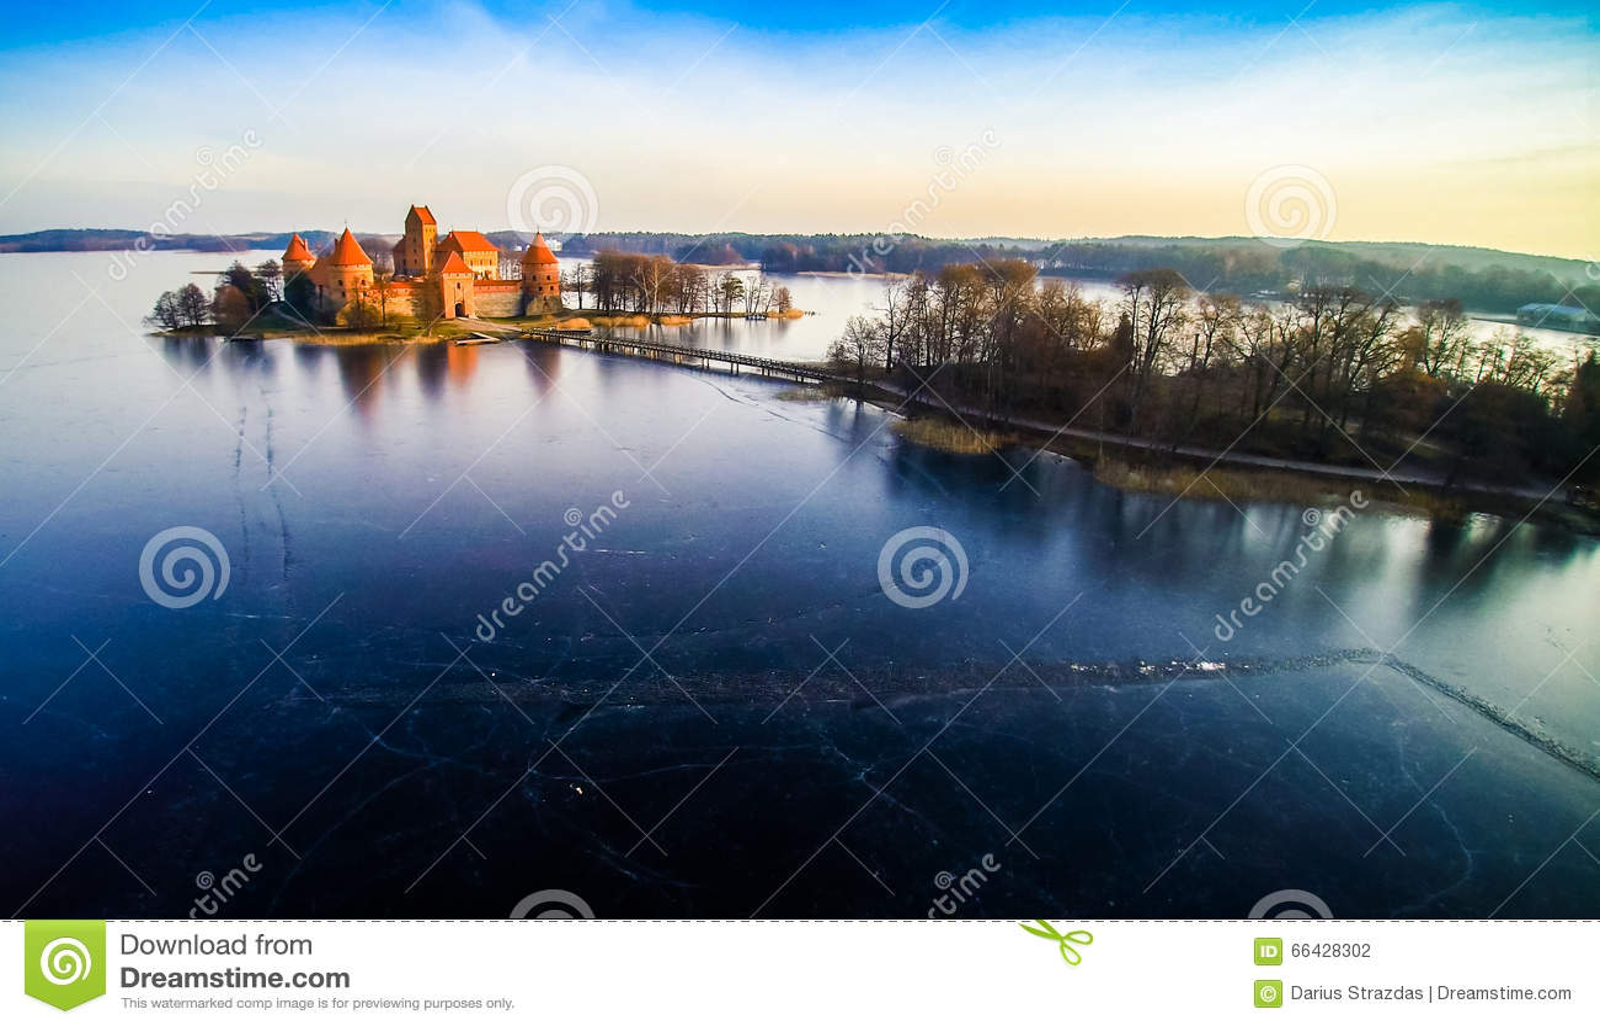 Замок Trakai